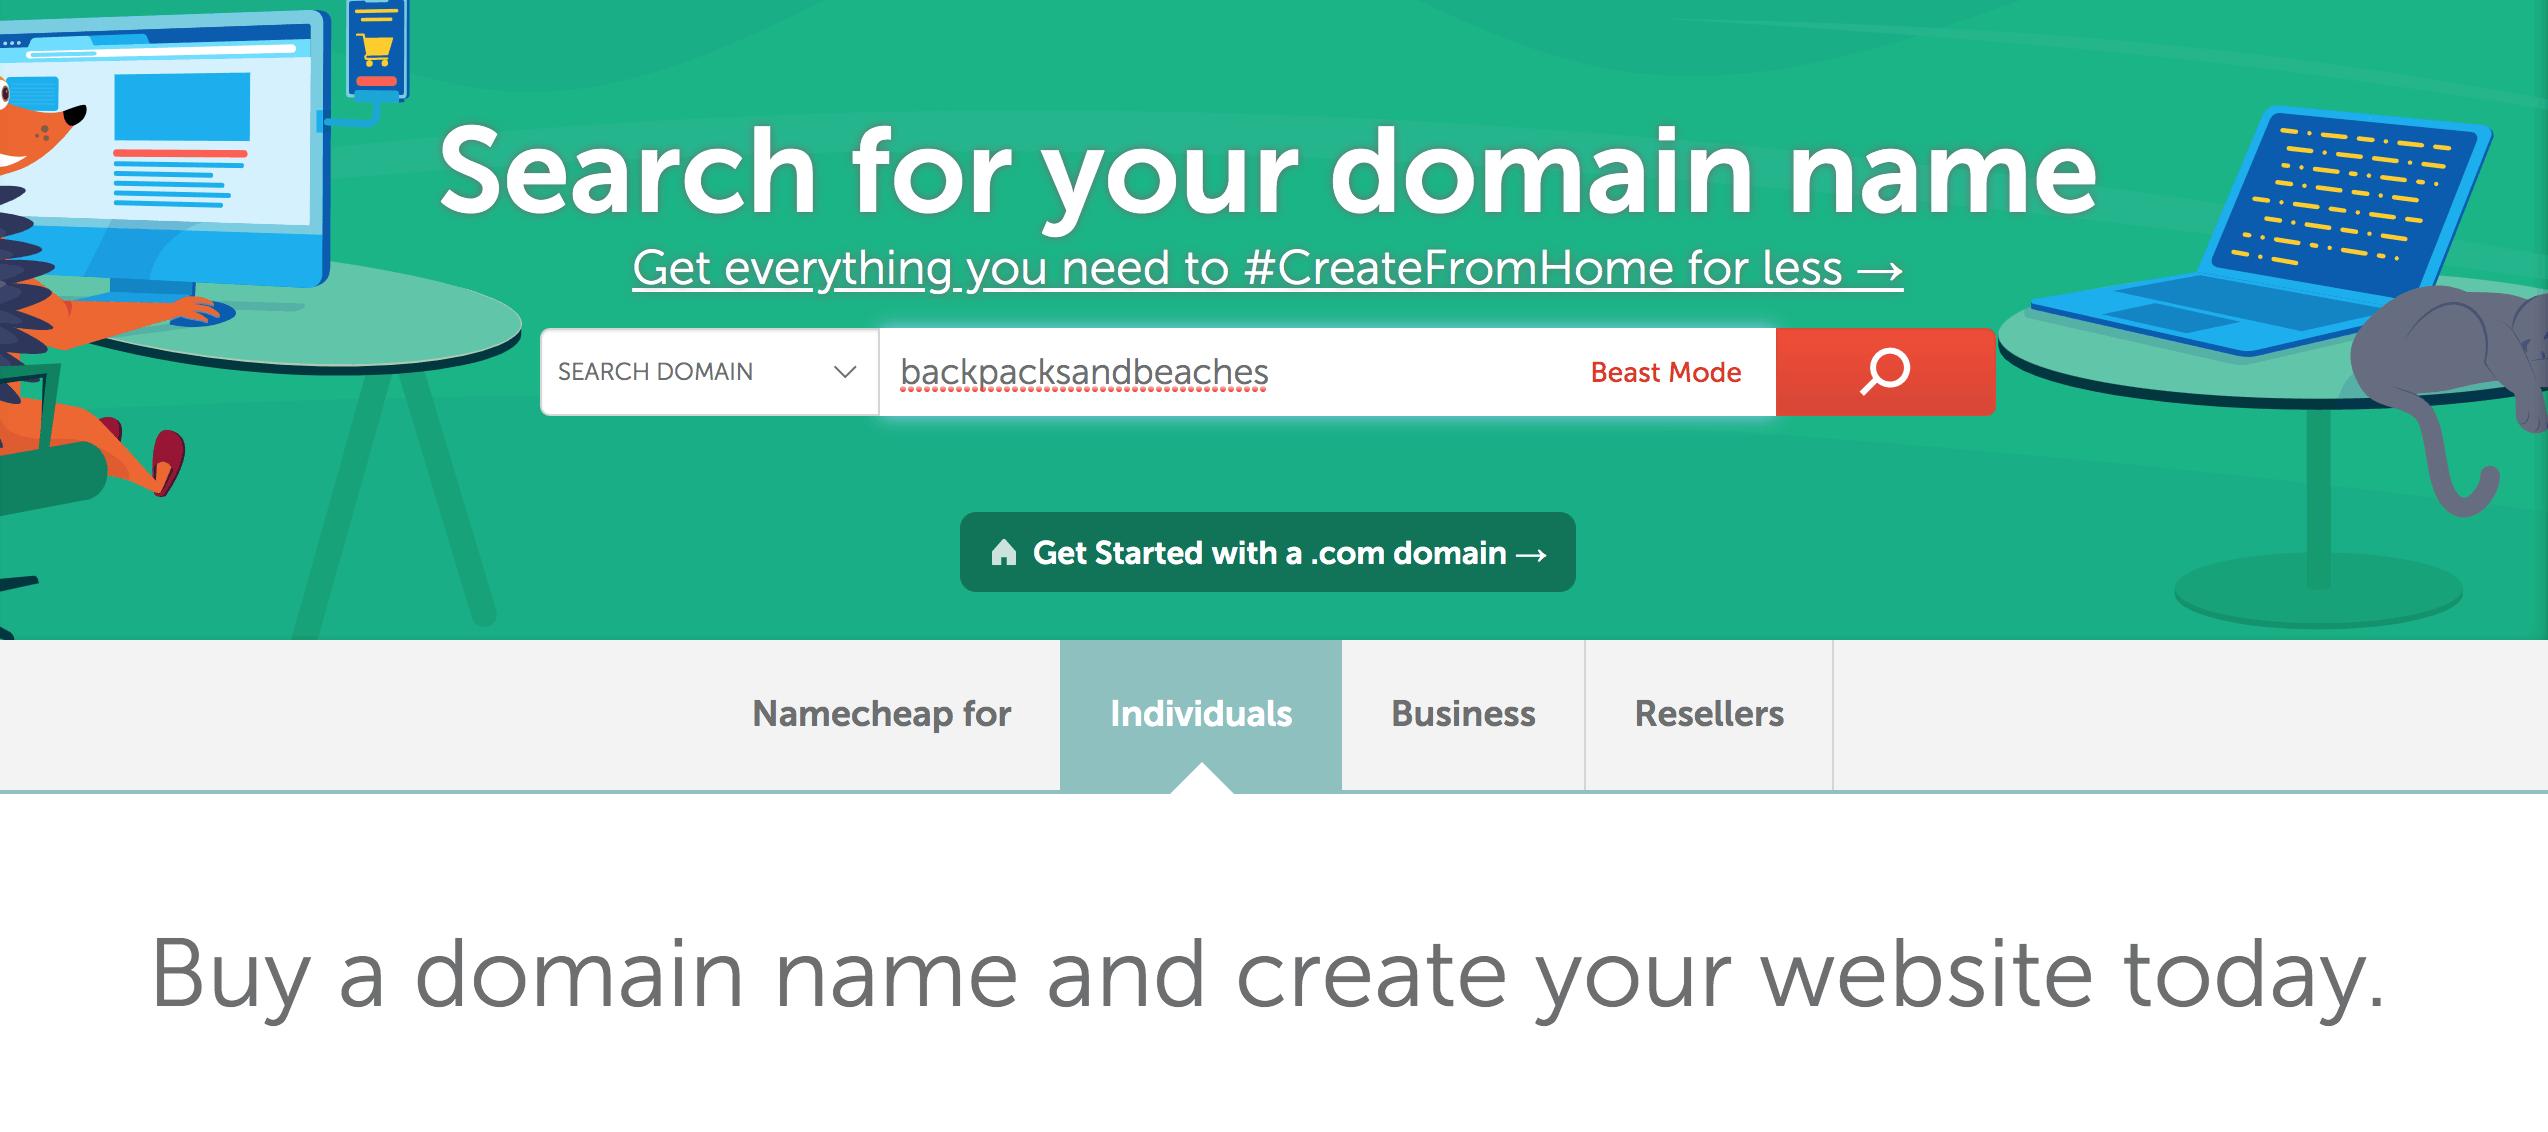 Namecheap website - buy your domain.